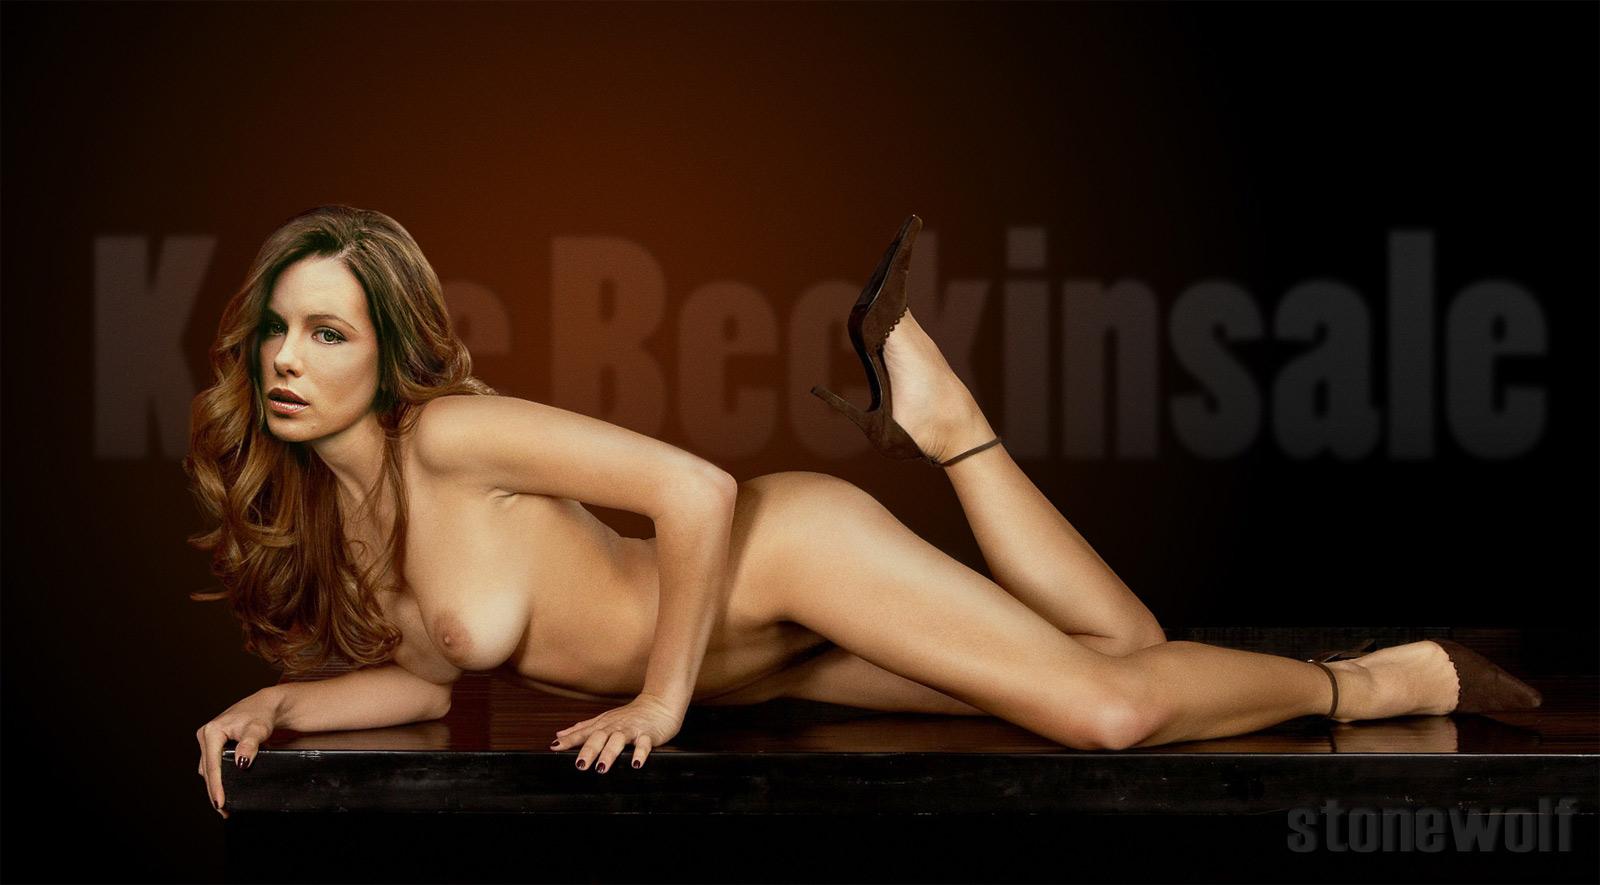 Kate Mulgrew Hot Nude